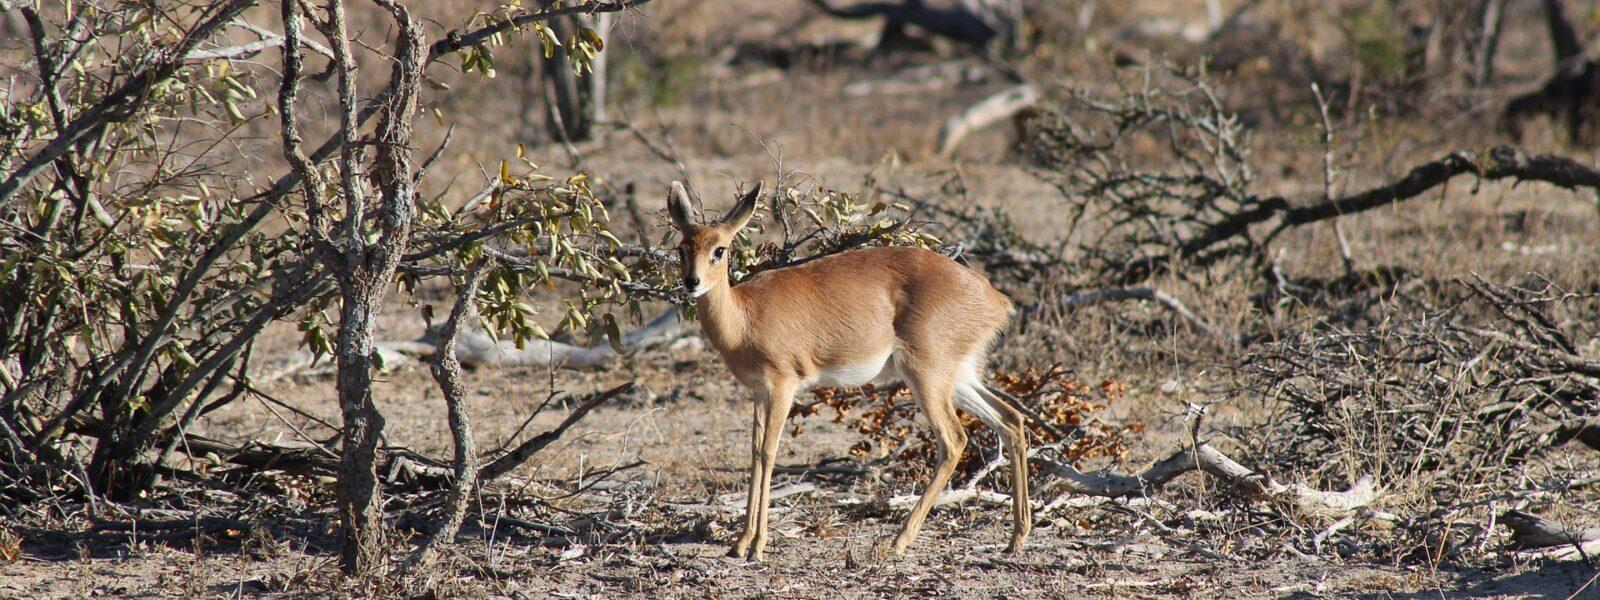 8 Days Remarkable Uganda Safari